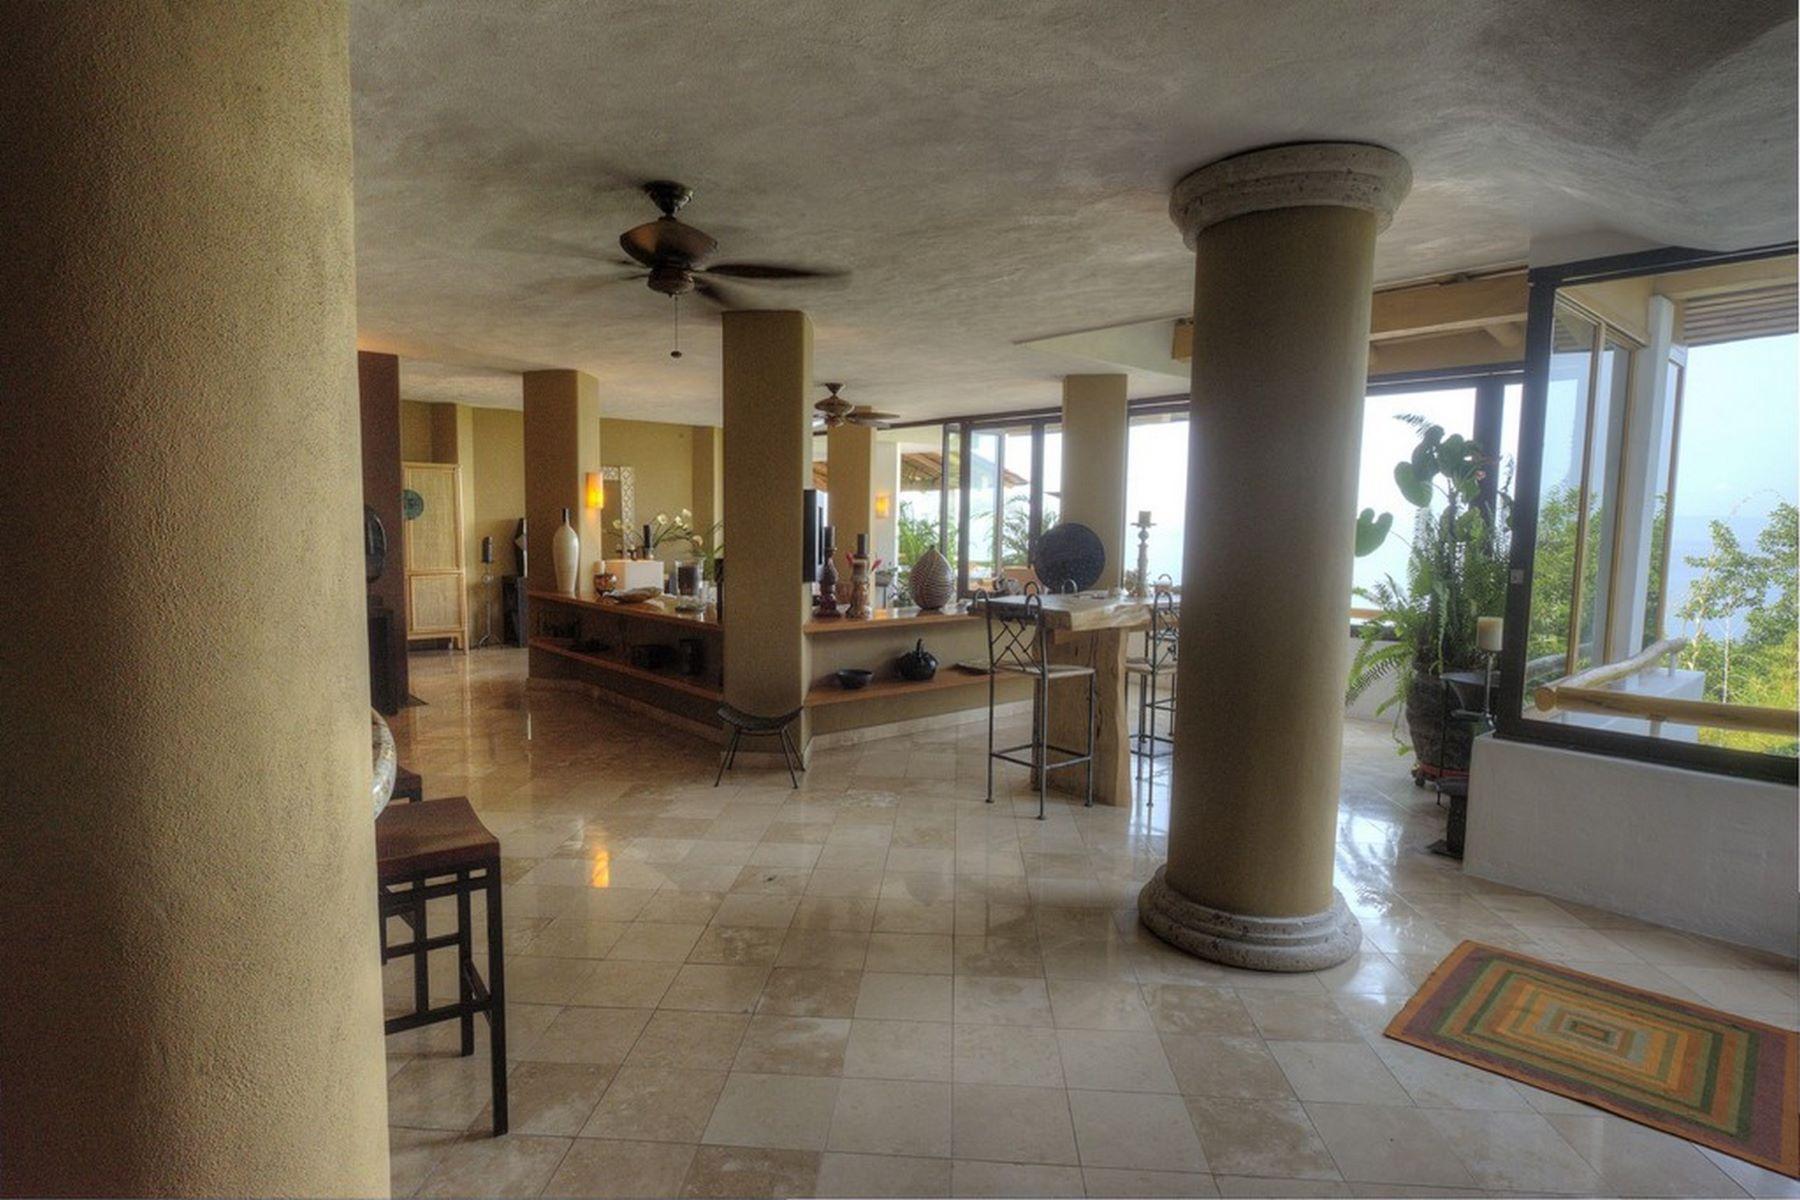 Additional photo for property listing at Montemar 8 Paseo de los Delfines 136 DP 8 Puerto Vallarta, Jalisco 48399 México